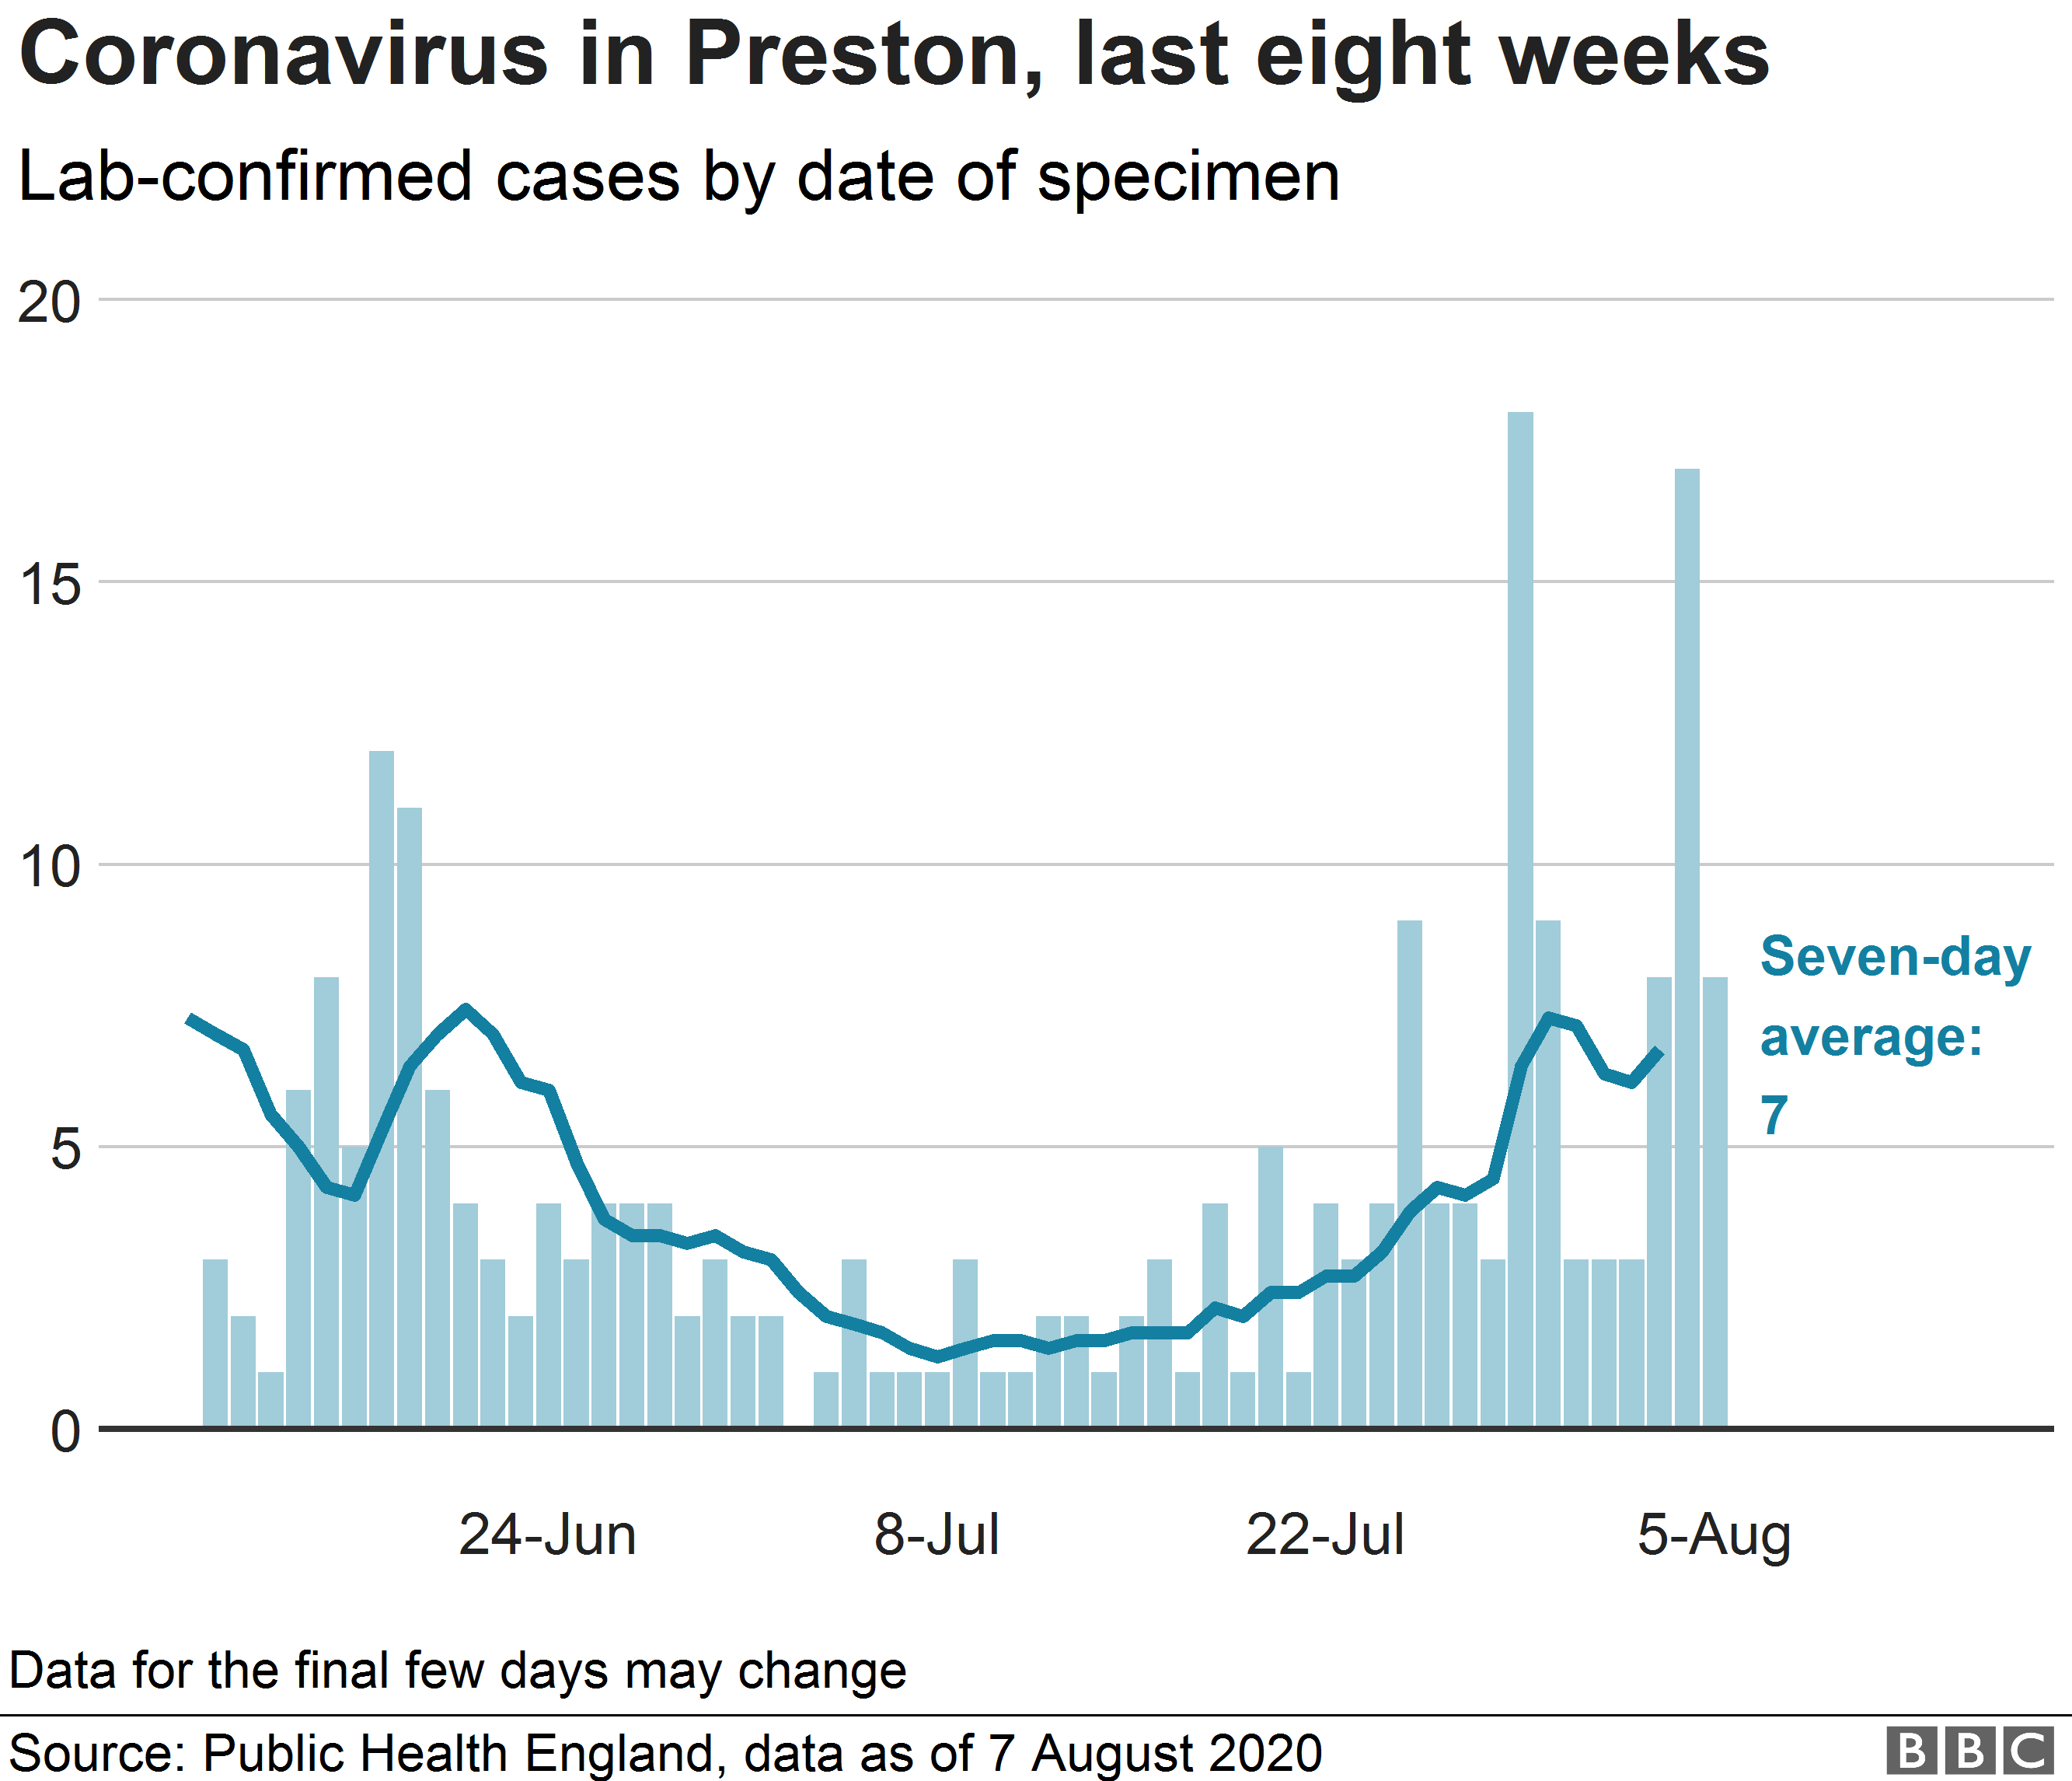 Chart showing coronavirus cases in Preston